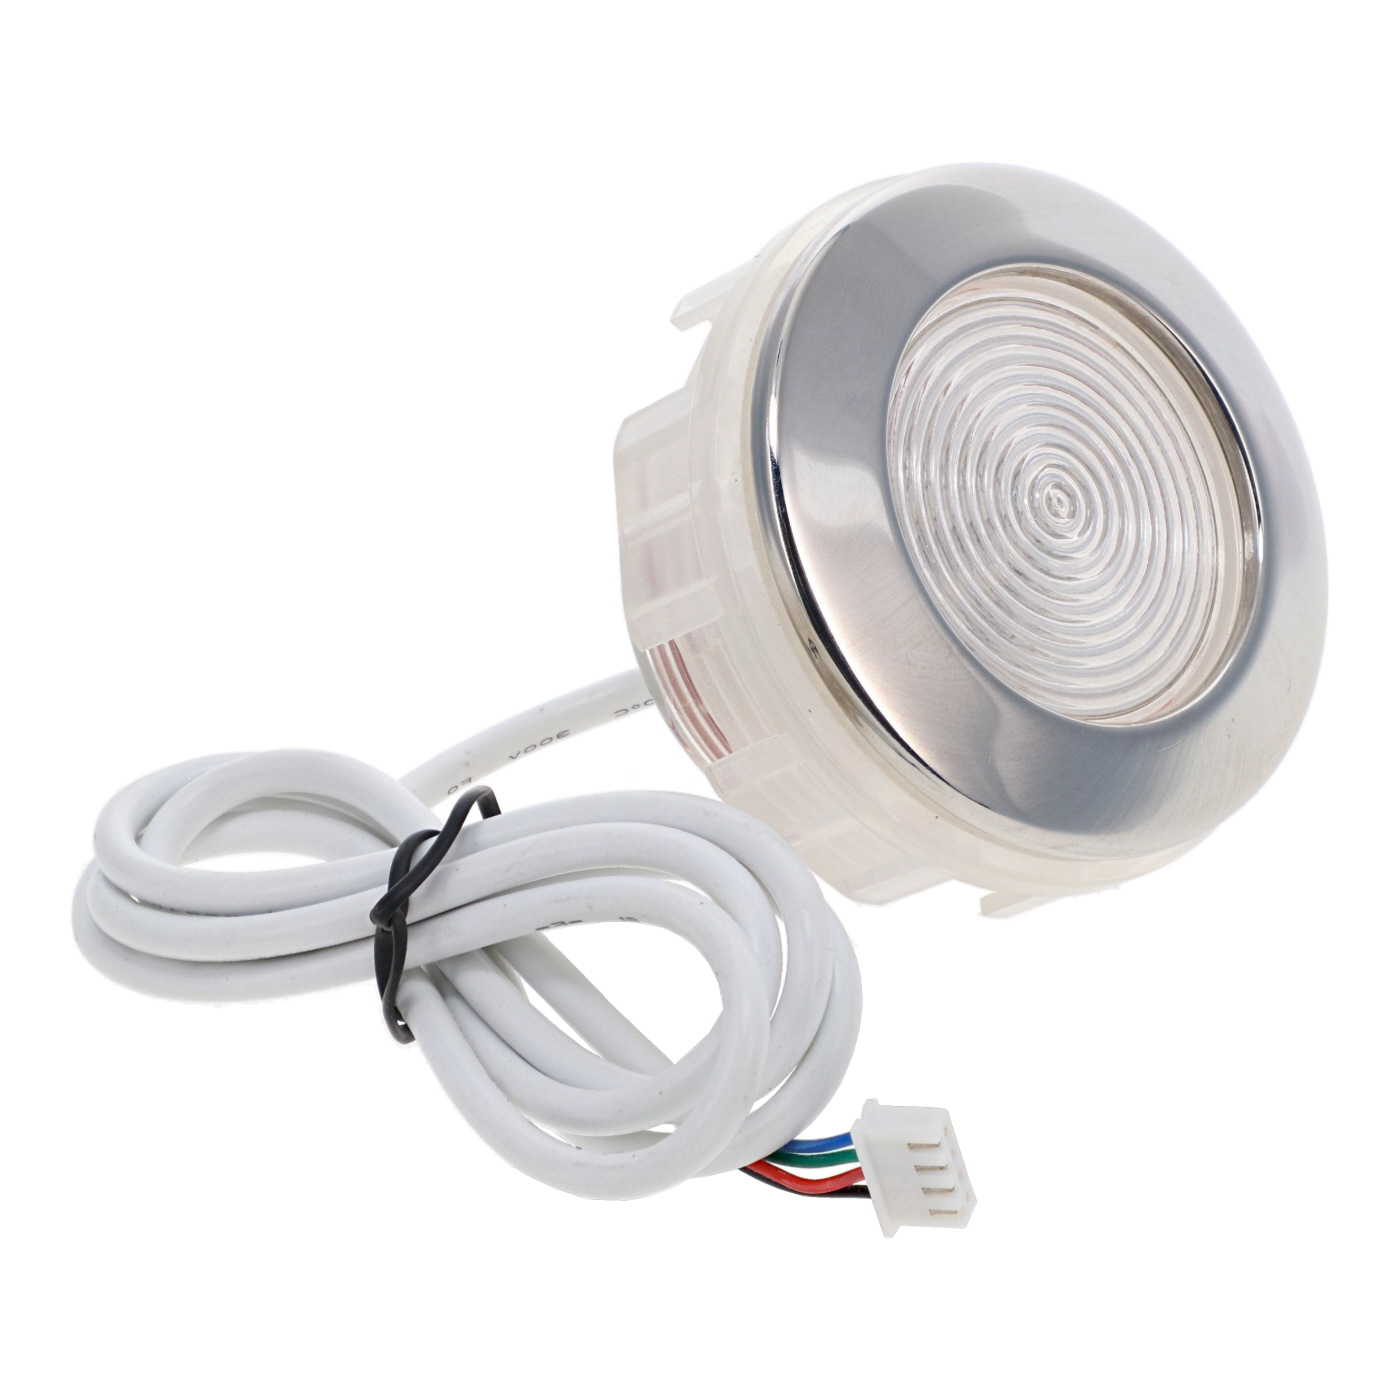 Projecteur LED complet 7cm RVB/RGB